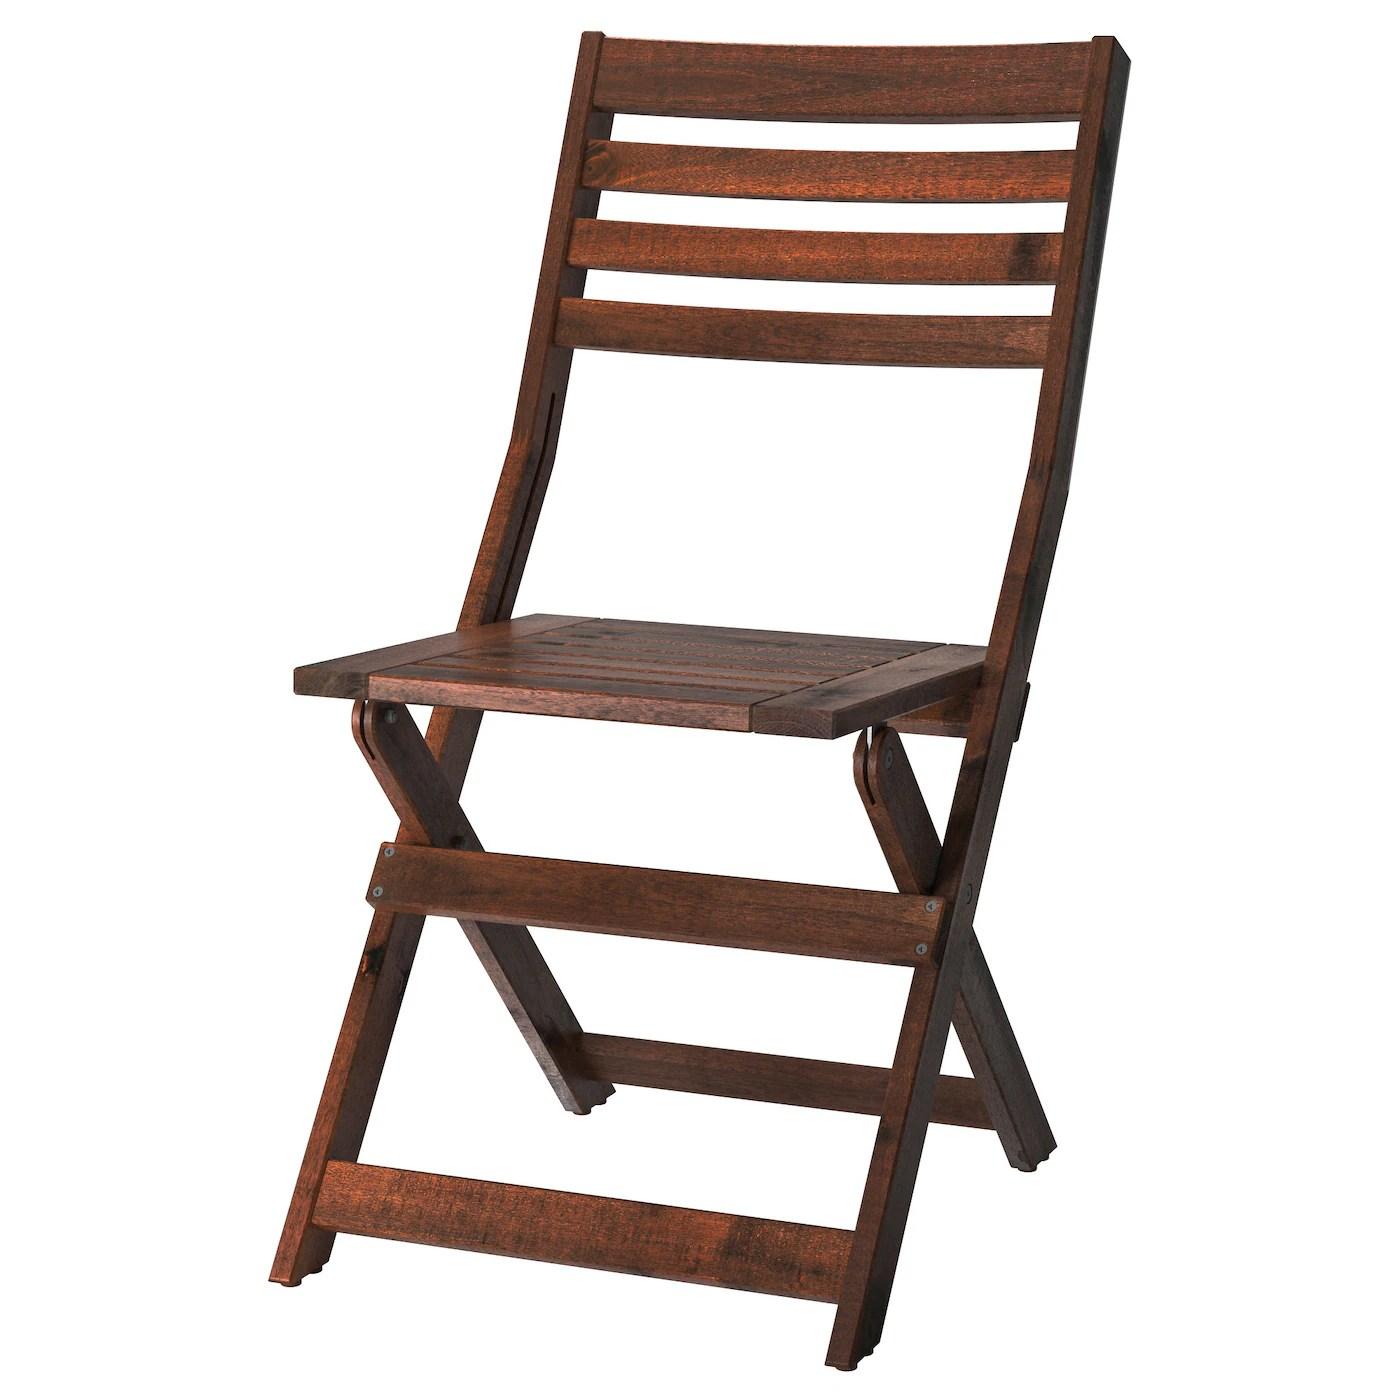 Chaise Longue Bois Ikea Ikea Chaiselongue Table Basse Rangement